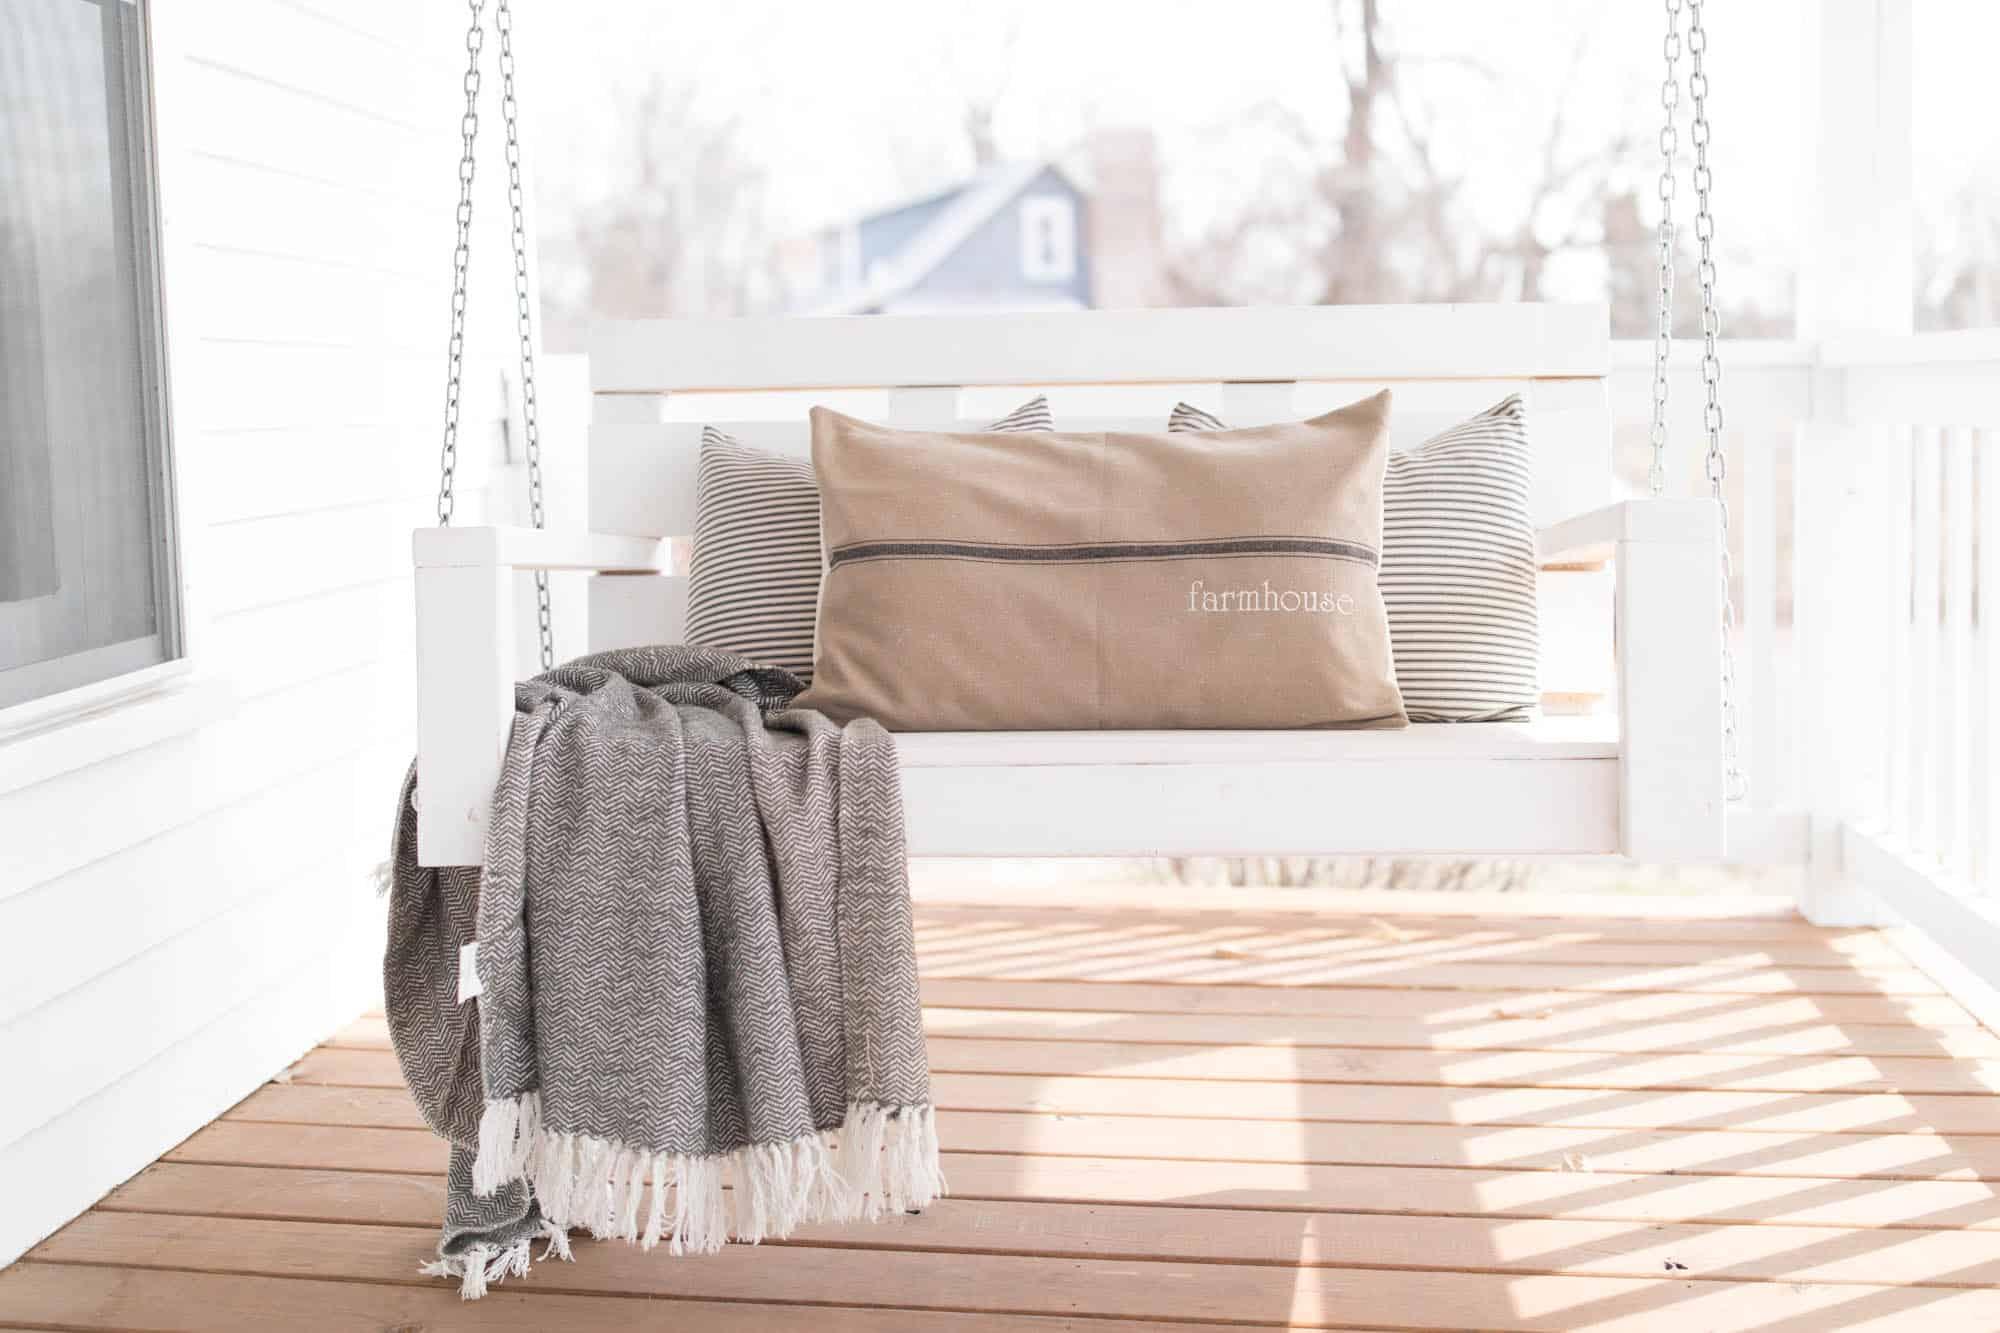 Farmhouse Grain Sack Pillow Cover Available With Blue